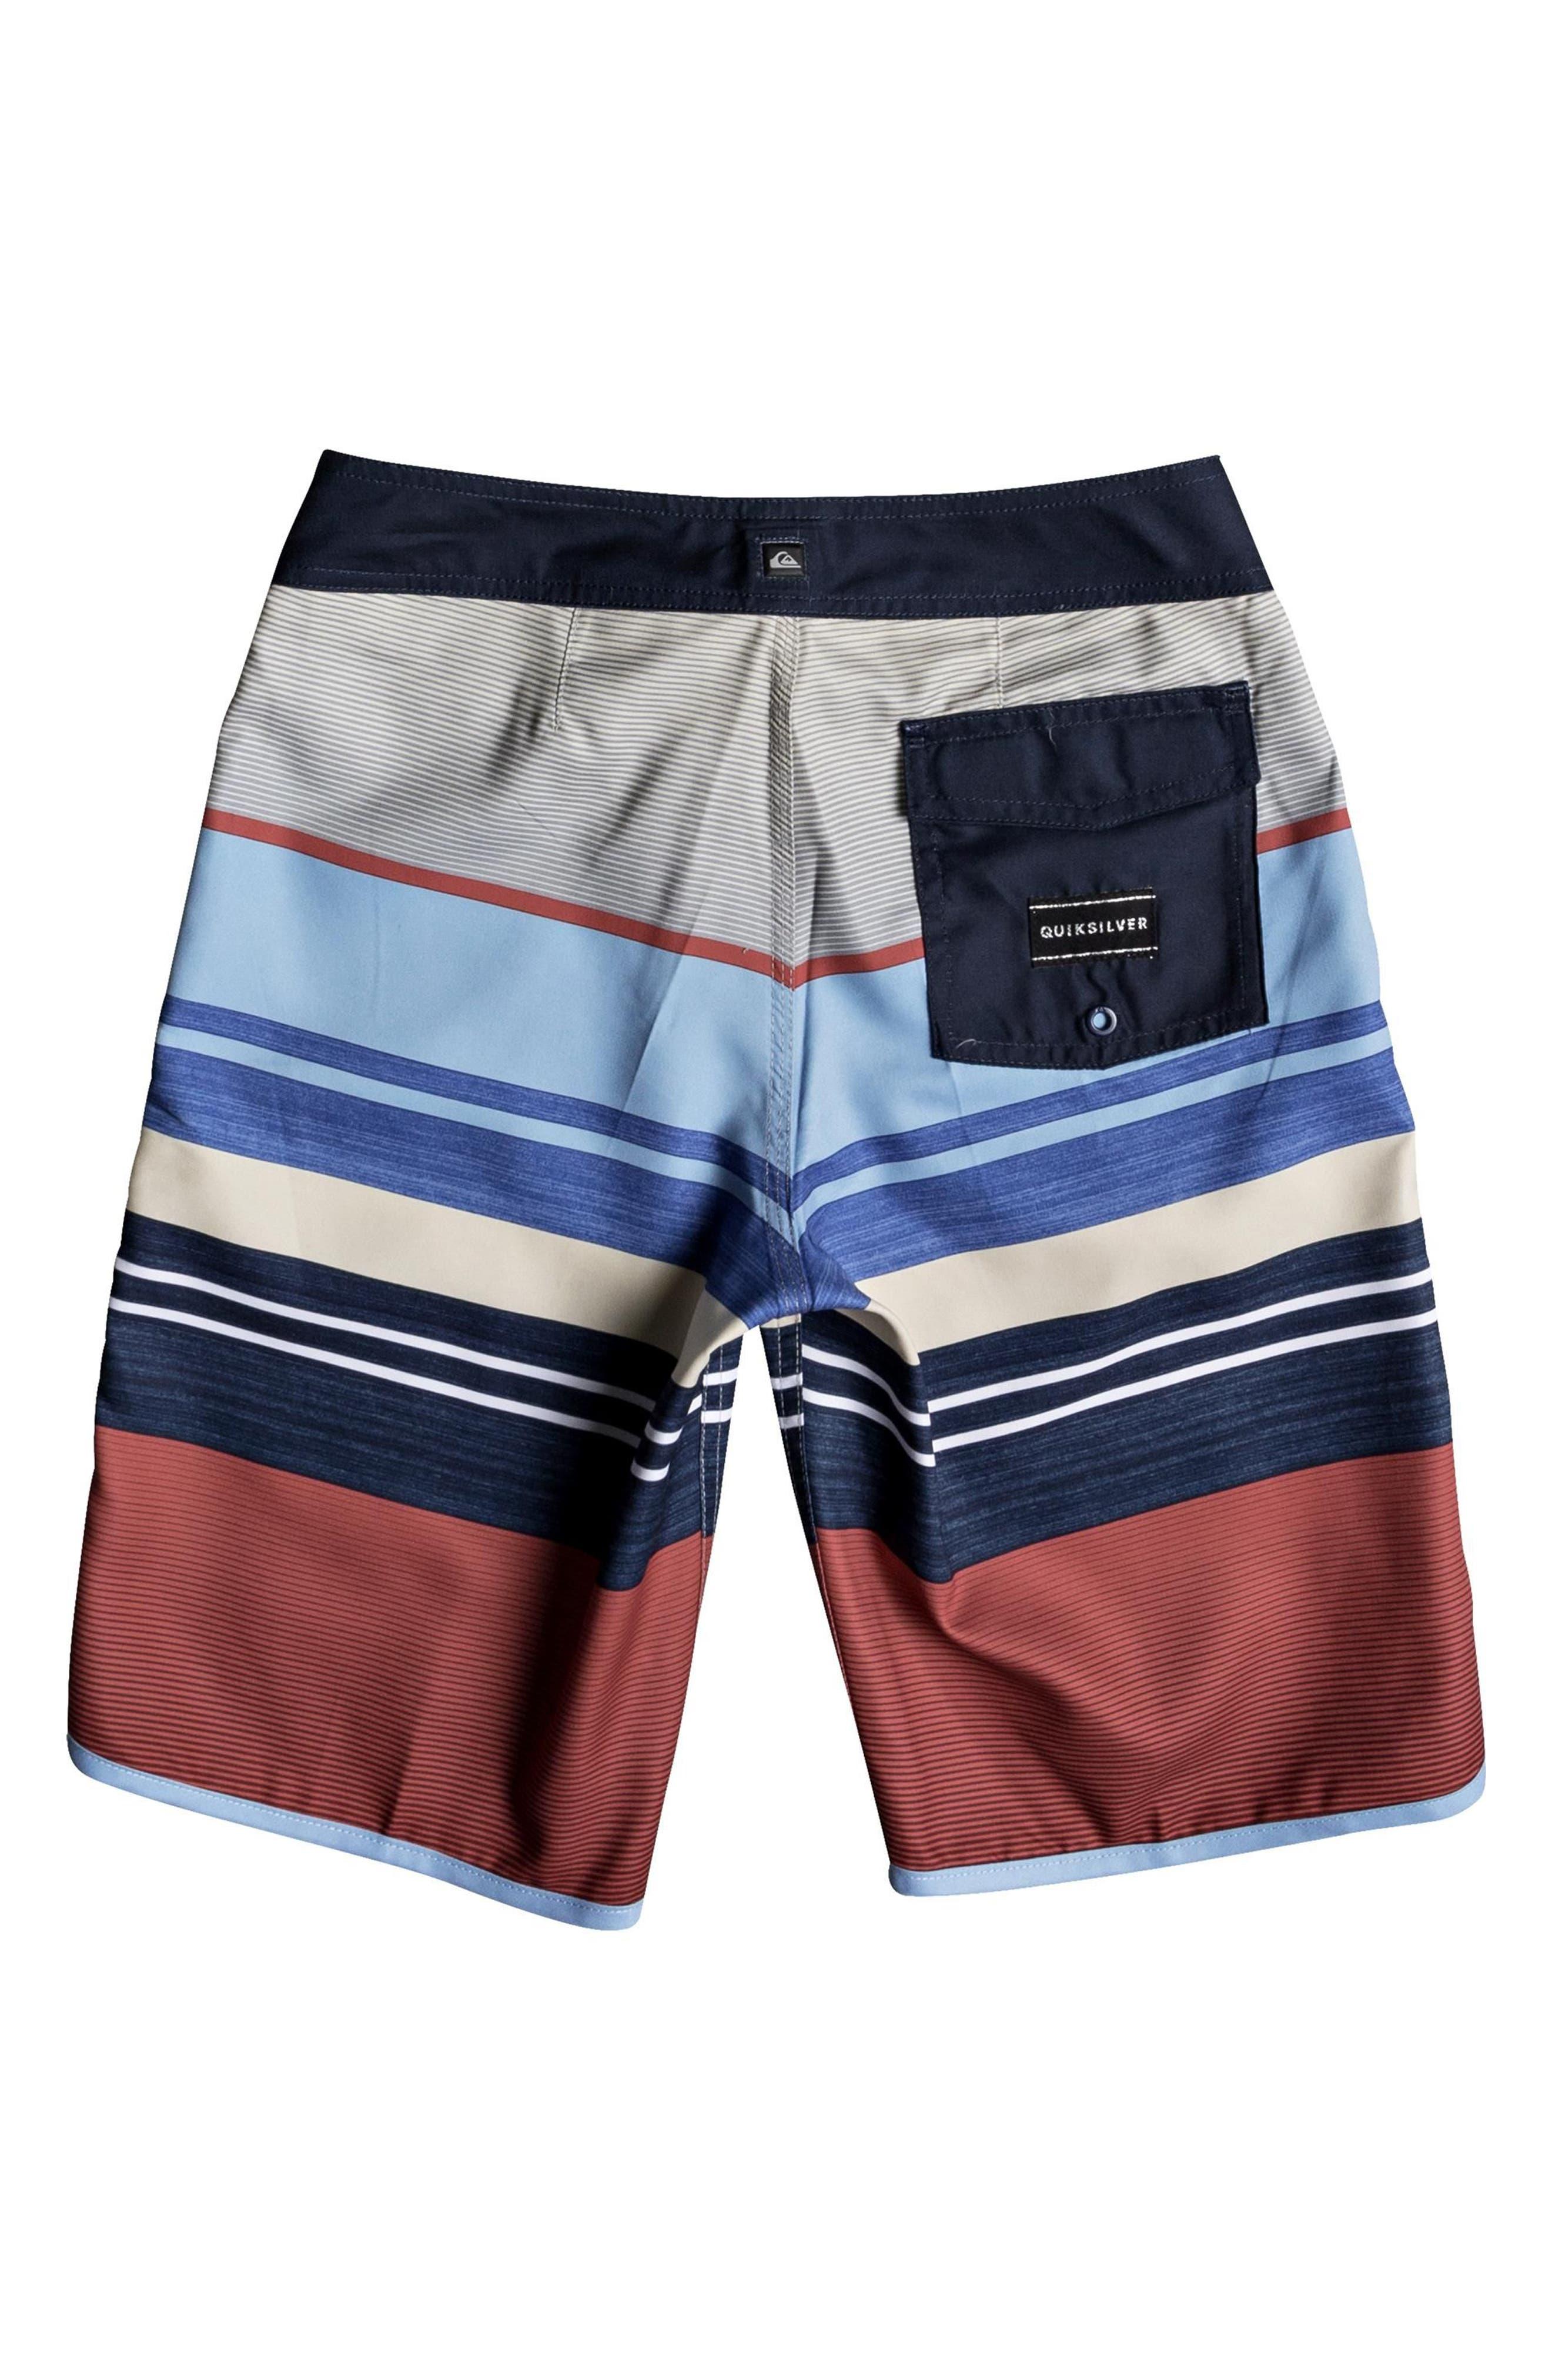 Eye Scalloped Board Shorts,                             Alternate thumbnail 4, color,